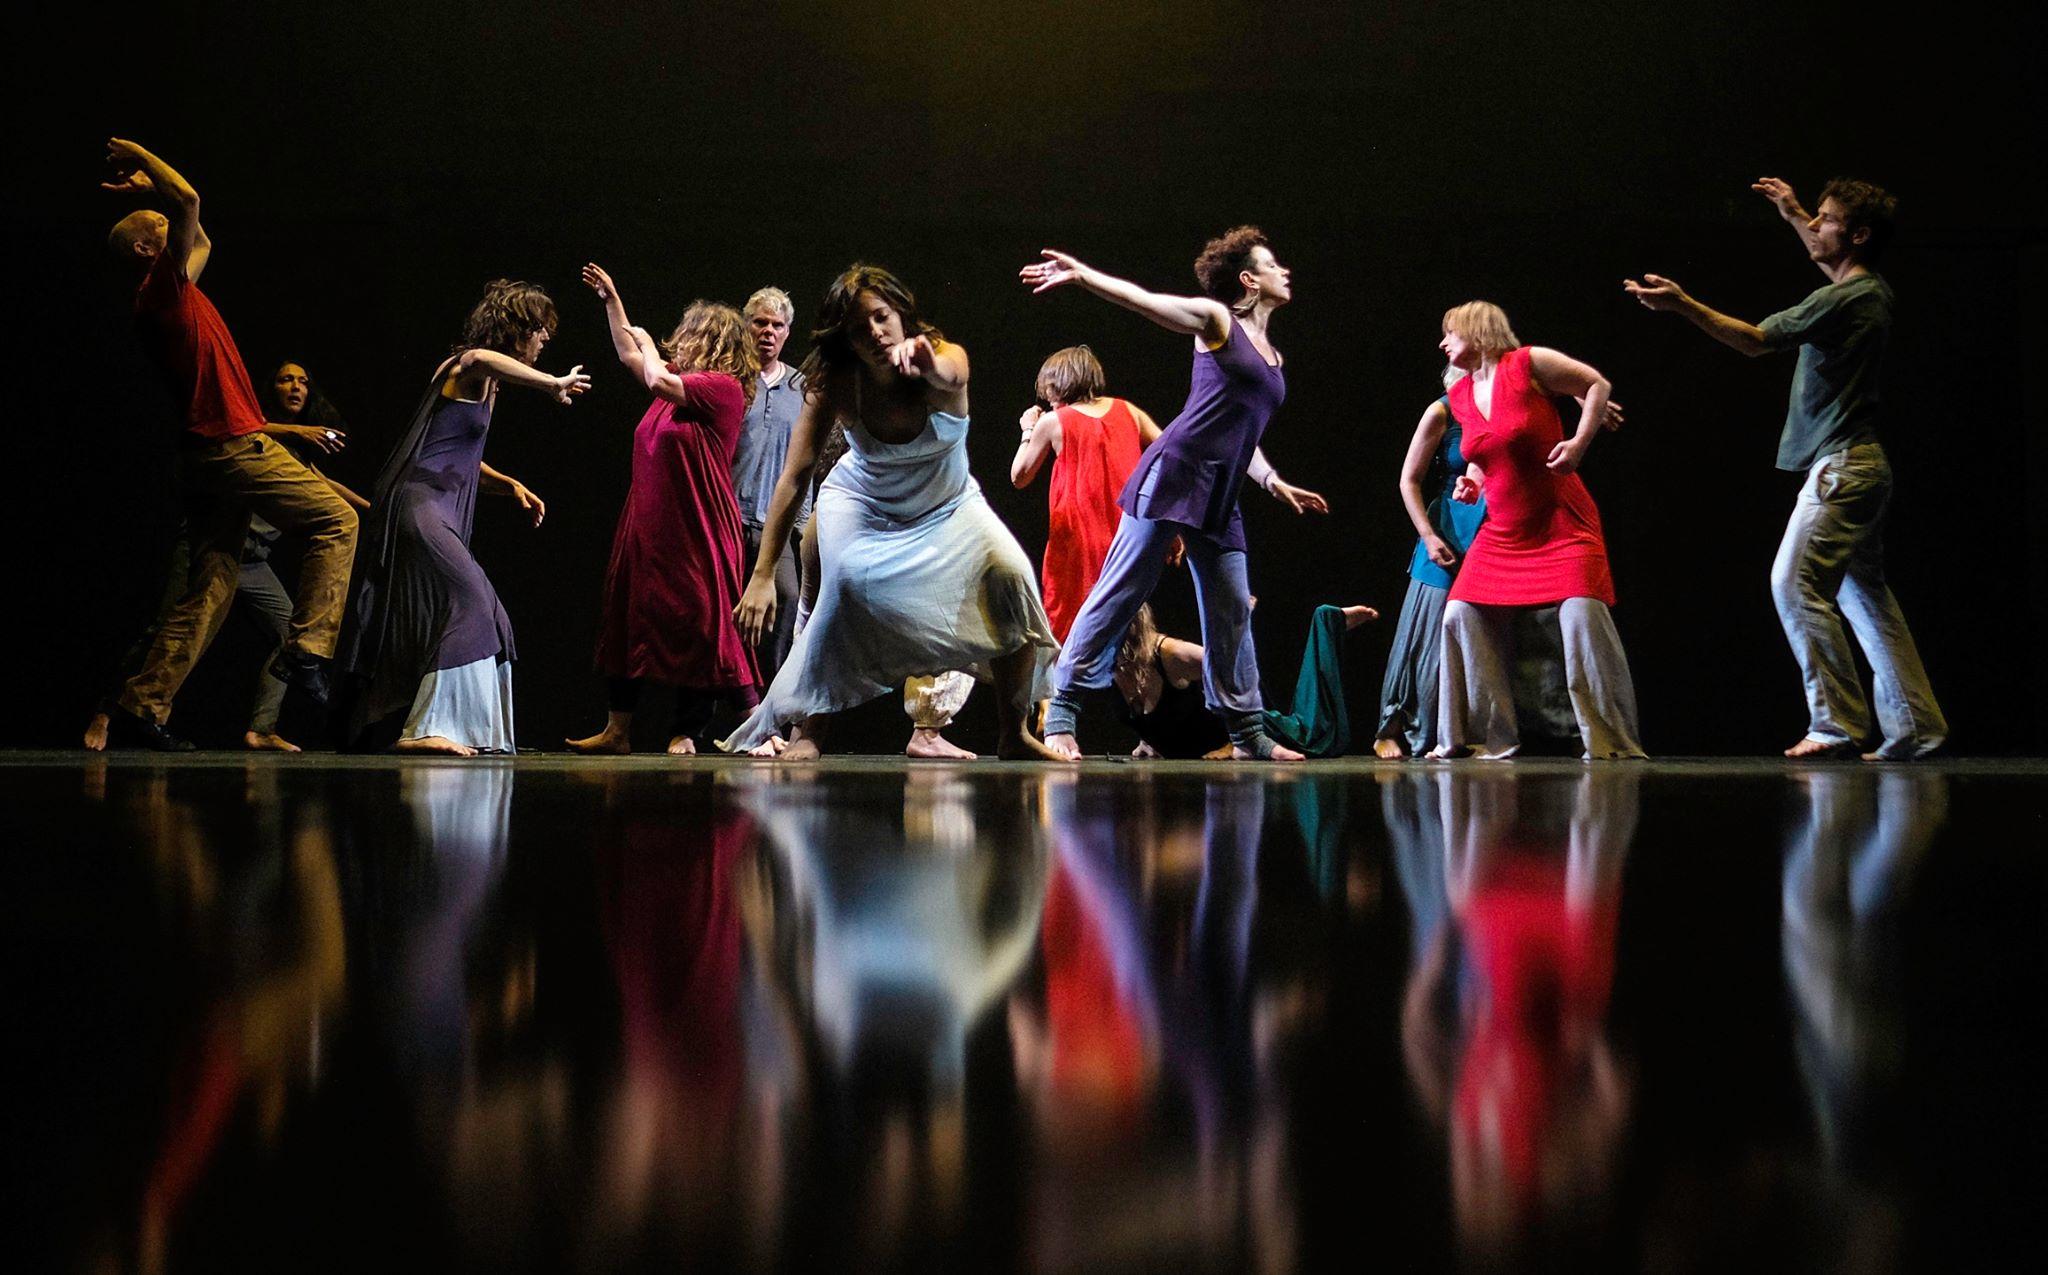 Danse des 5 Rythmes Bruxelles / 5 Rhythms Dance Wave Brussels